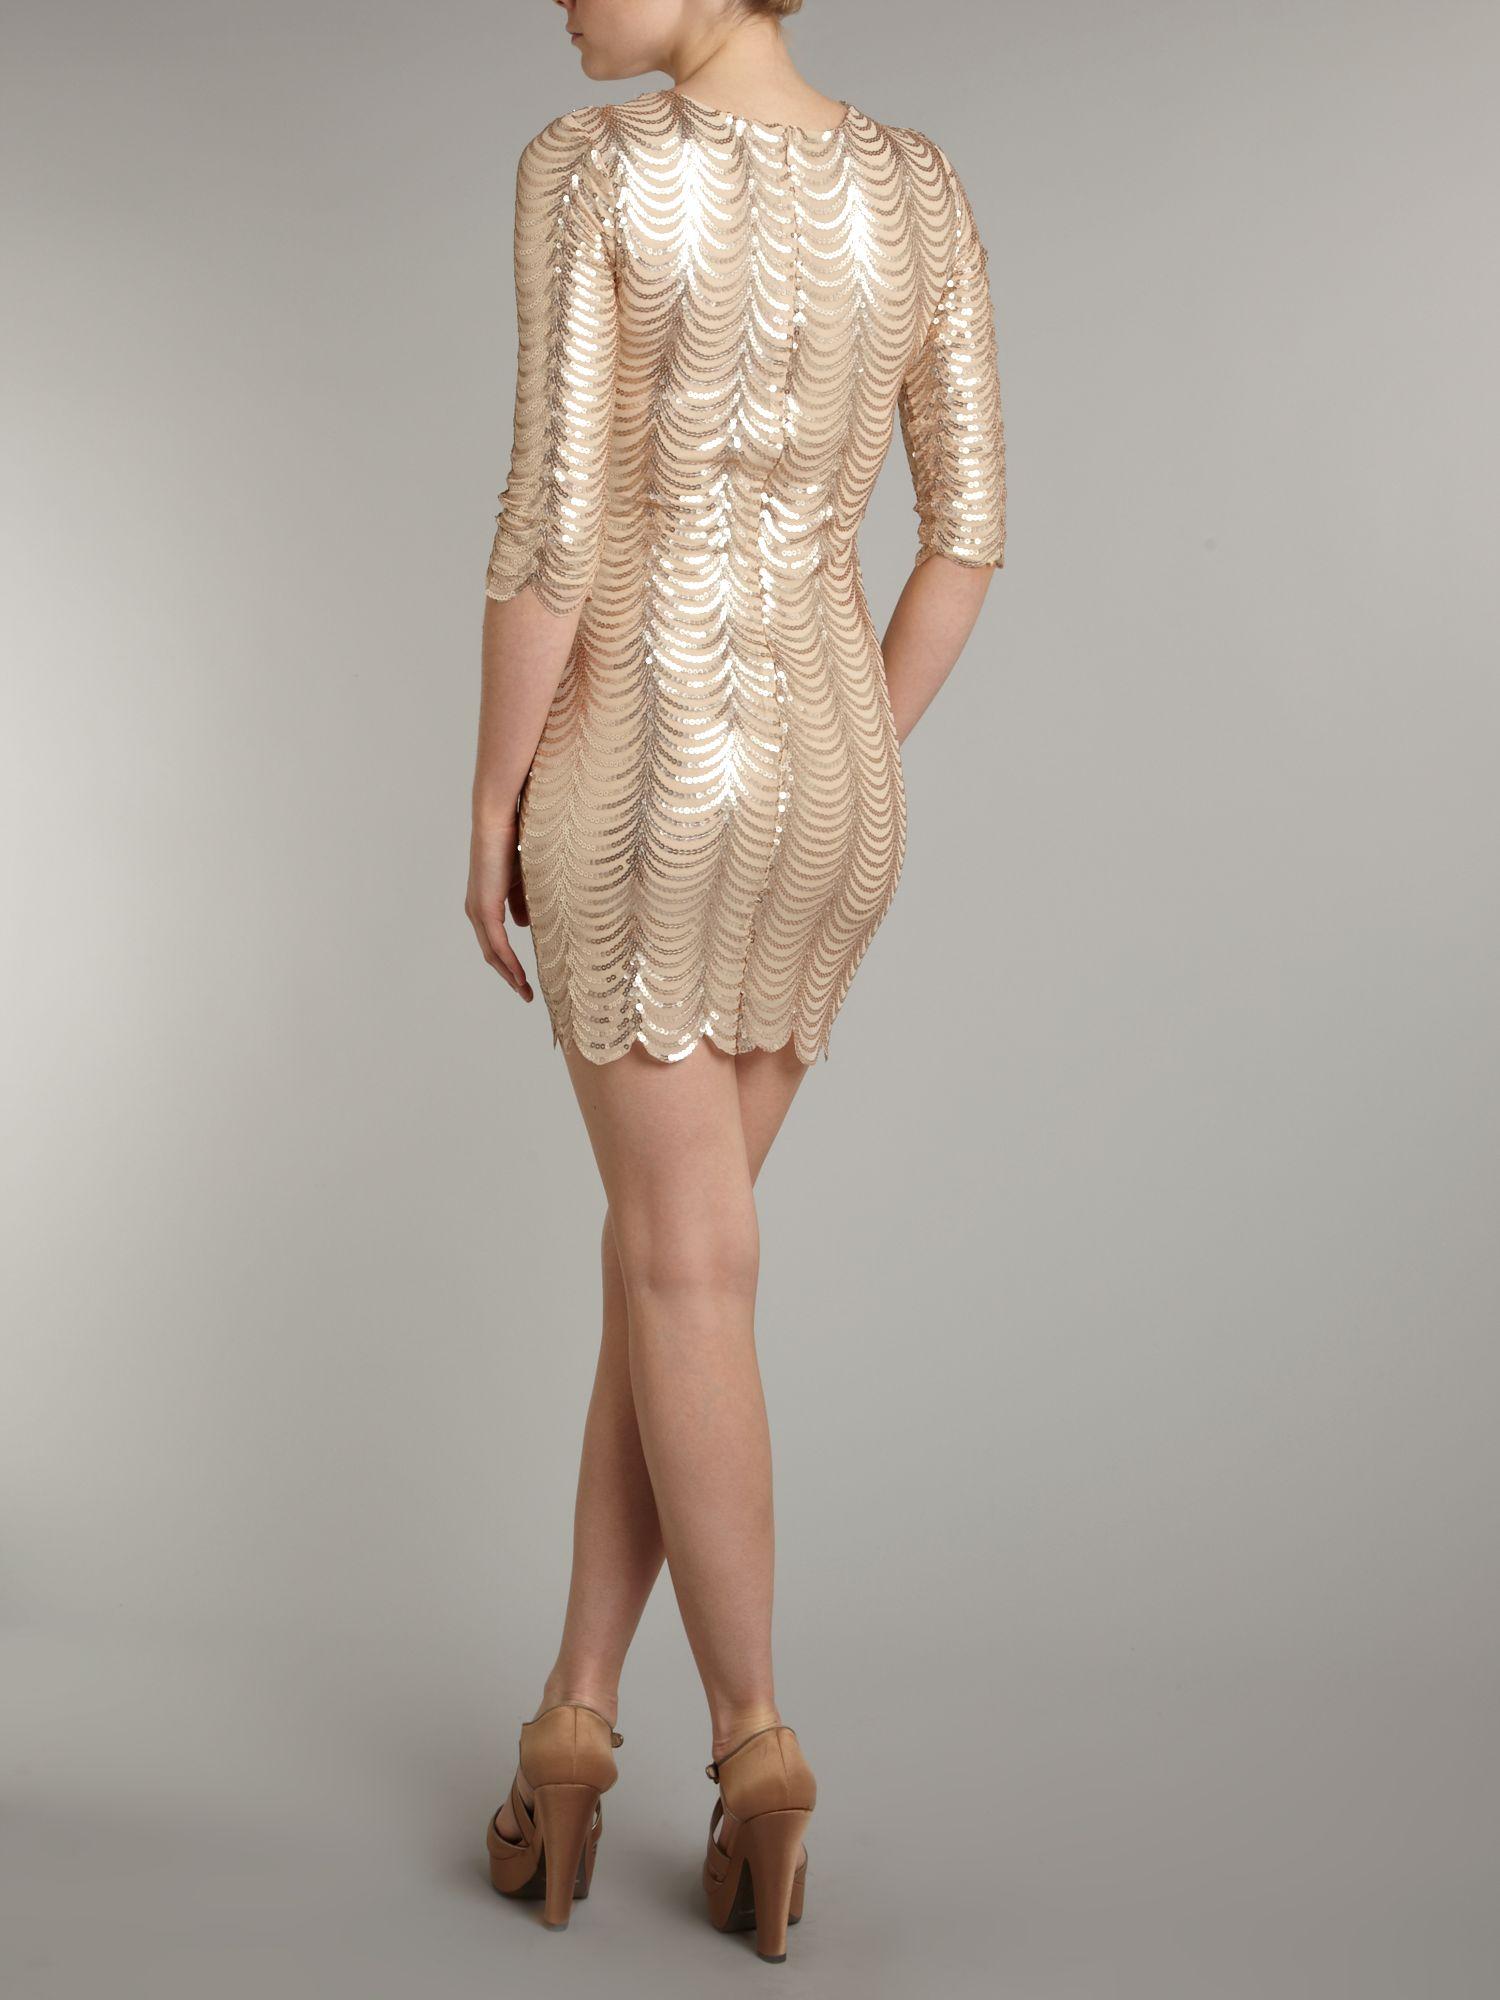 Tfnc london Scalloped Sequin Dress in Metallic  Lyst